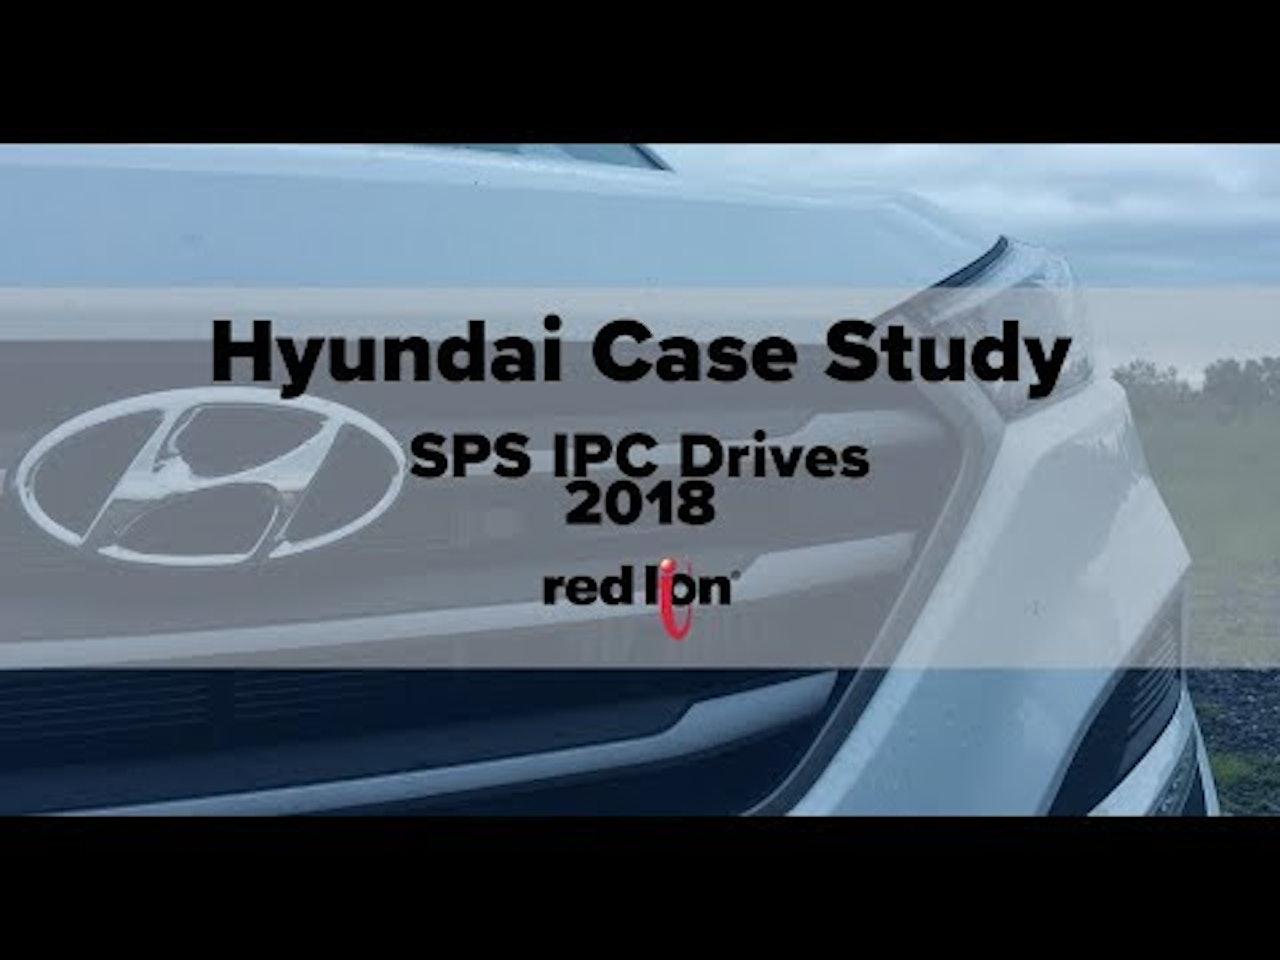 Hyundai Case Study